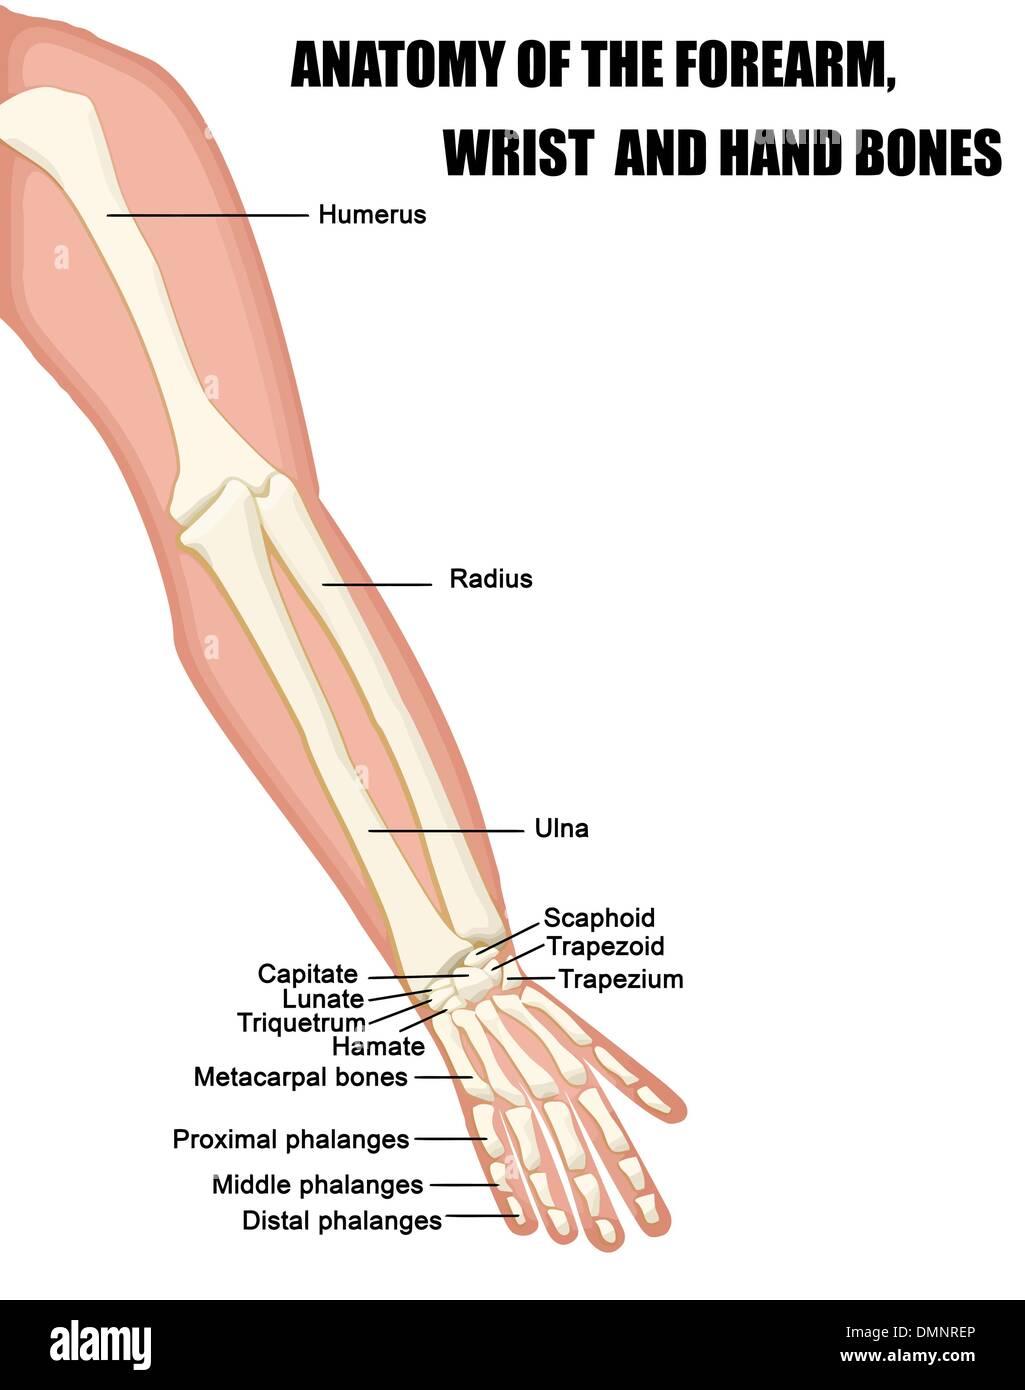 Anatomy Of The Forearm Wrist And Hand Bones Stock Vector Art